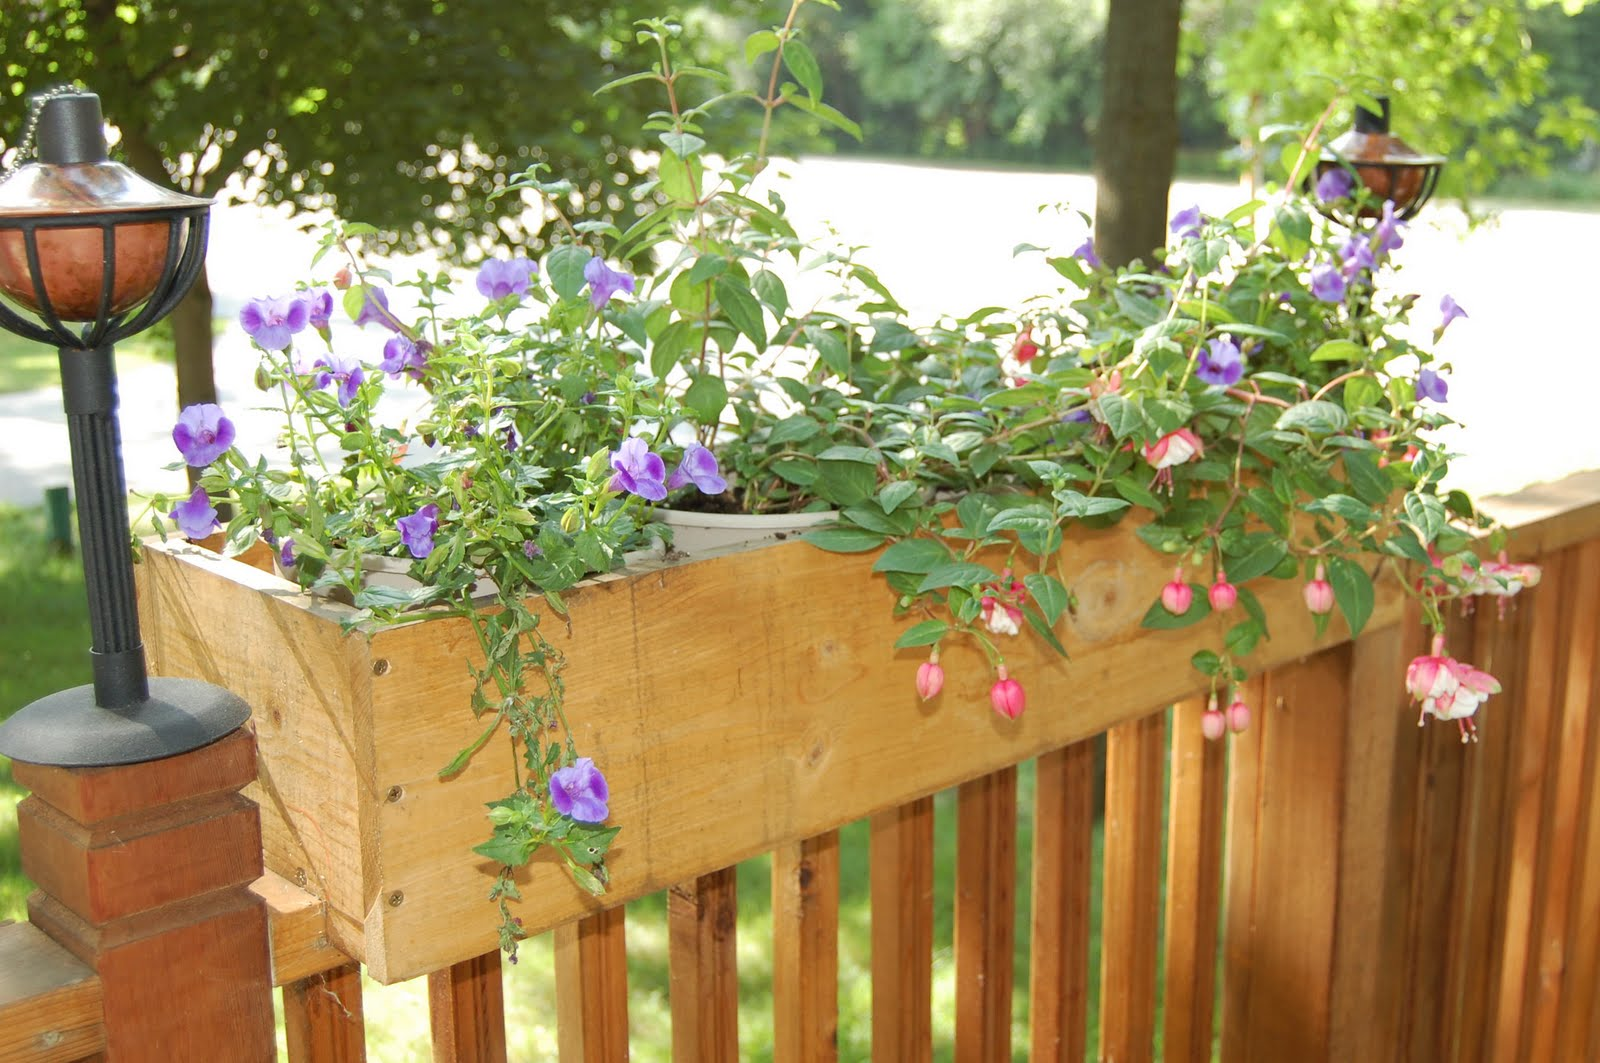 The green caterpillar in the garden deck planters for Garden decking planters